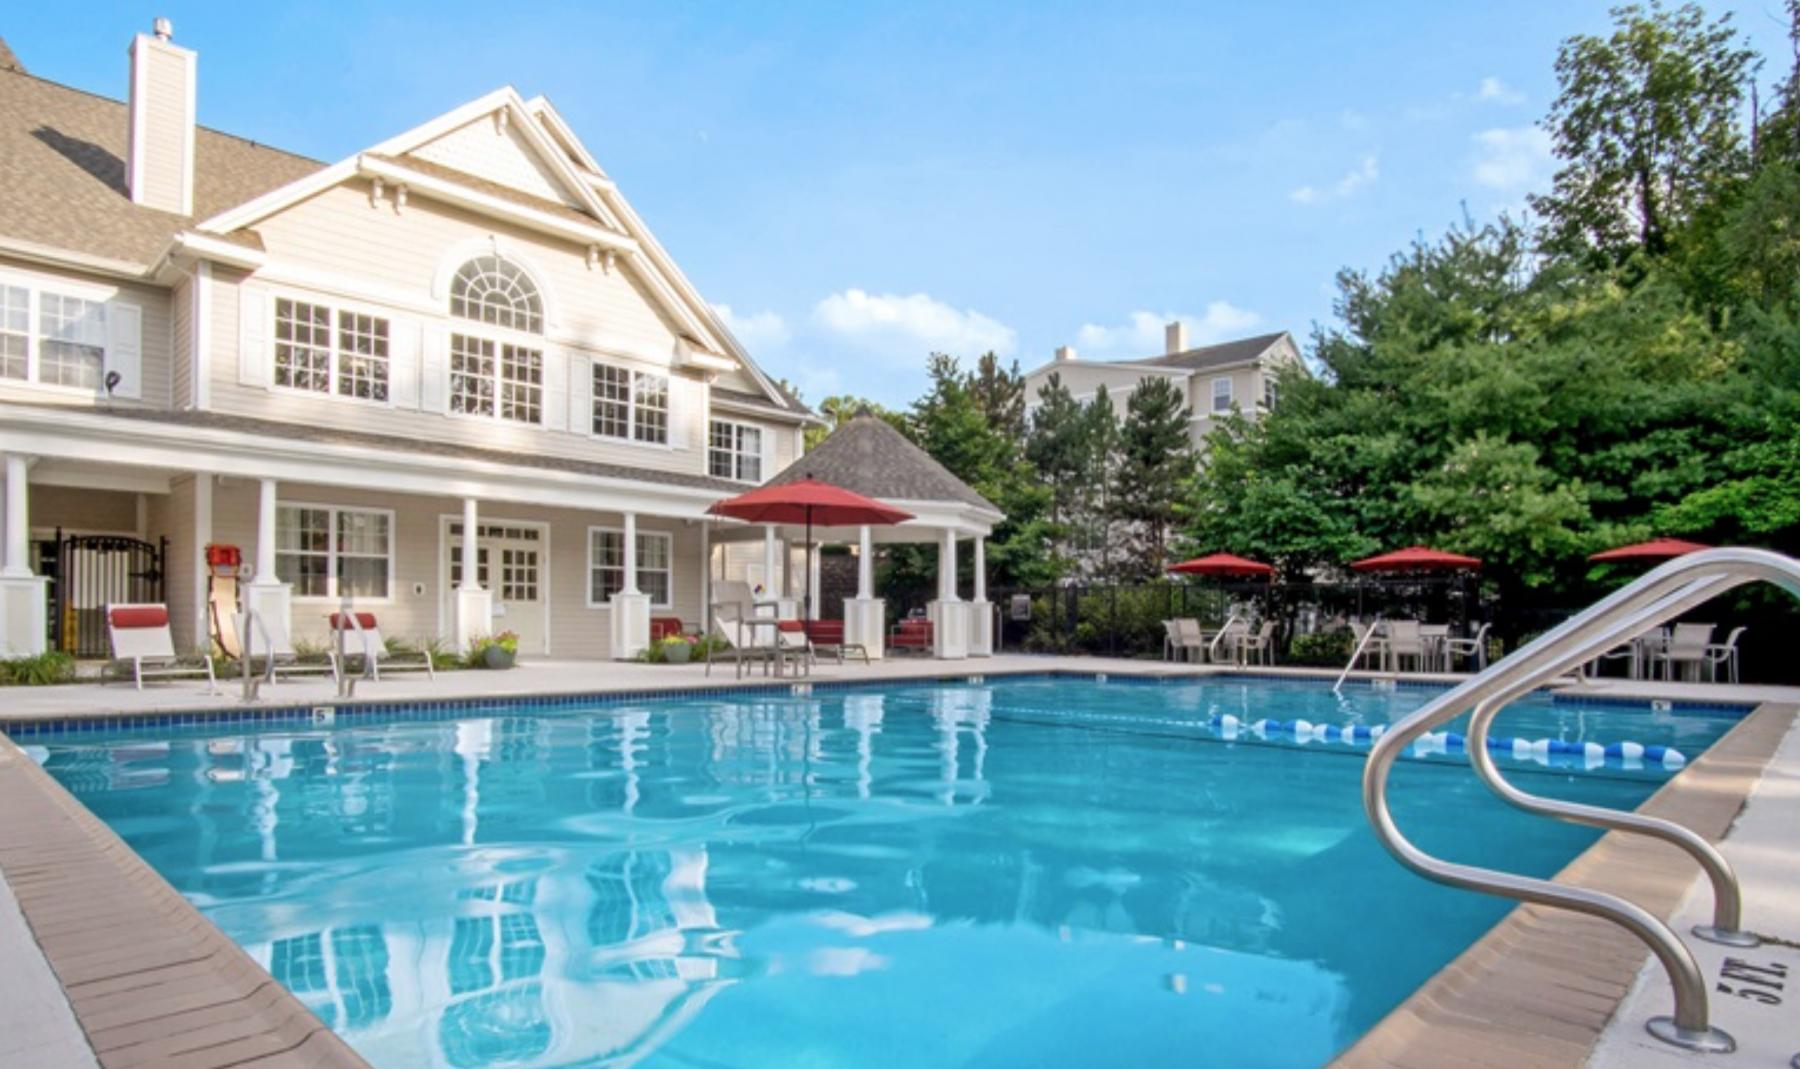 10 - Pool Deck & Elevation